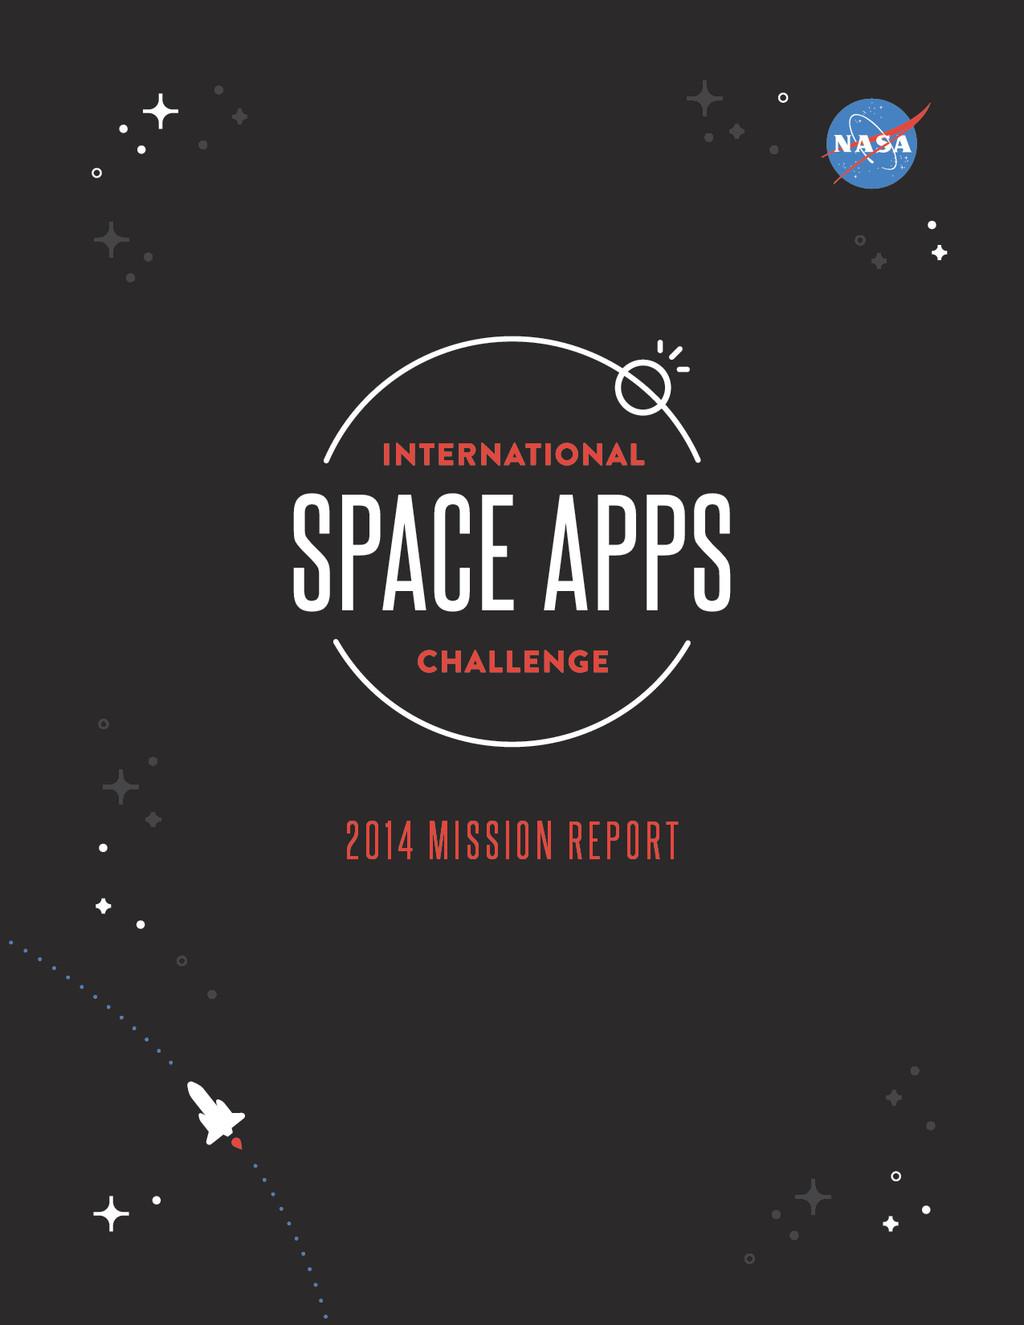 2014 MISSION REPORT